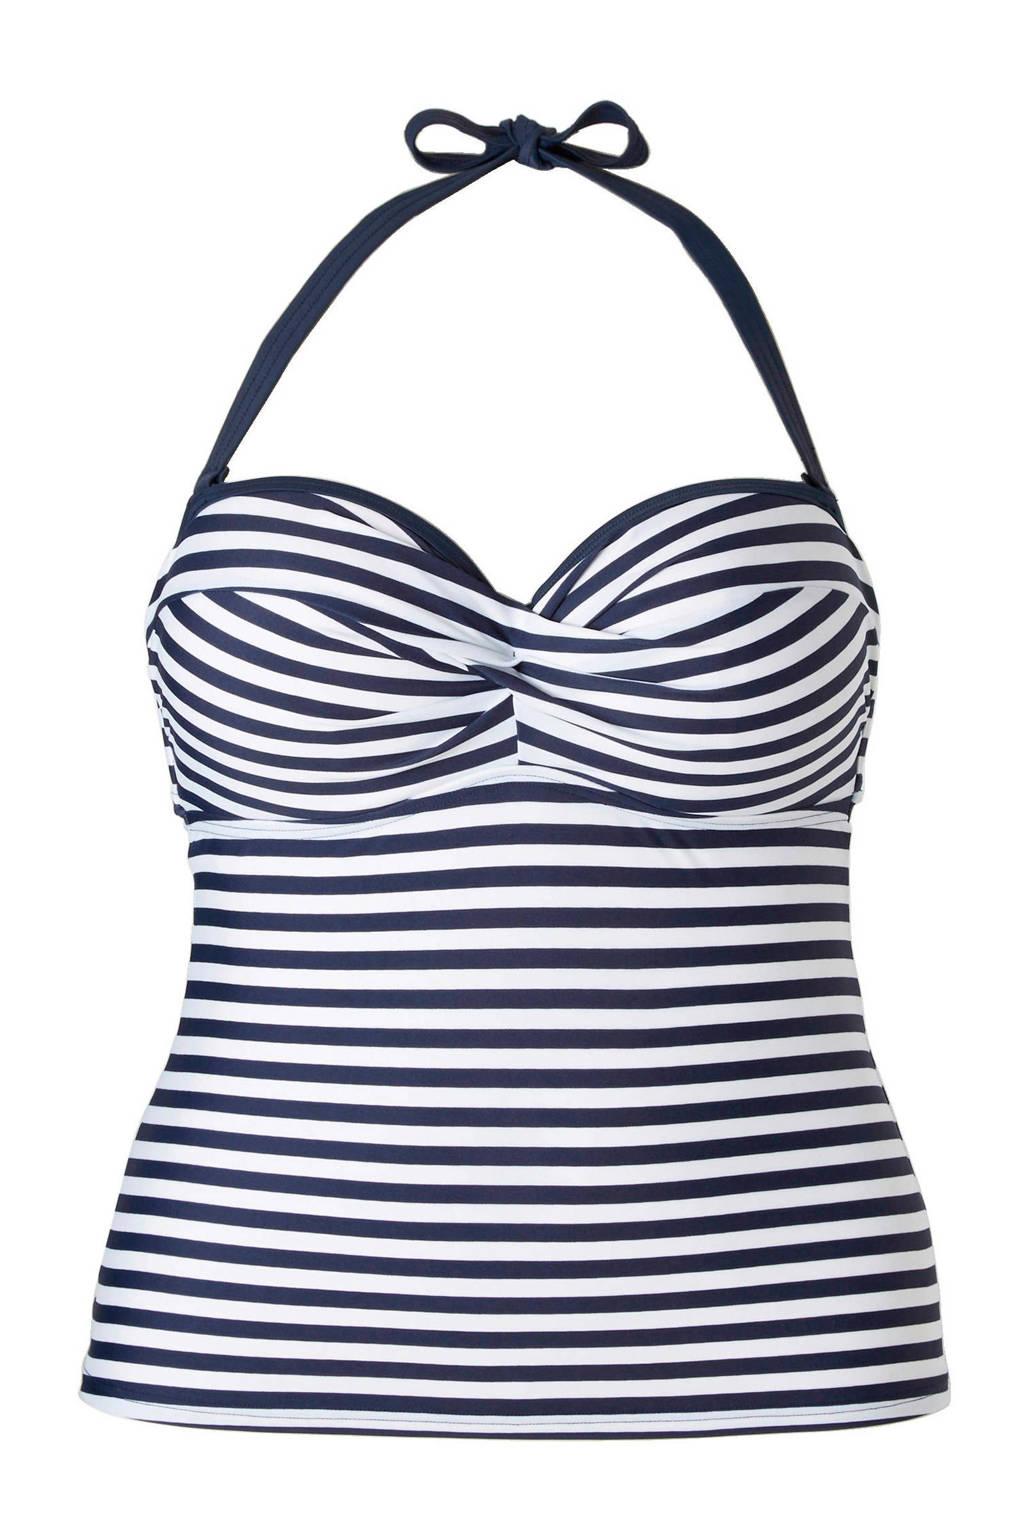 ESPRIT Women Beach Mix & Match gestreept tankini bikinitop voorgevormd blauw, Blauw/wit